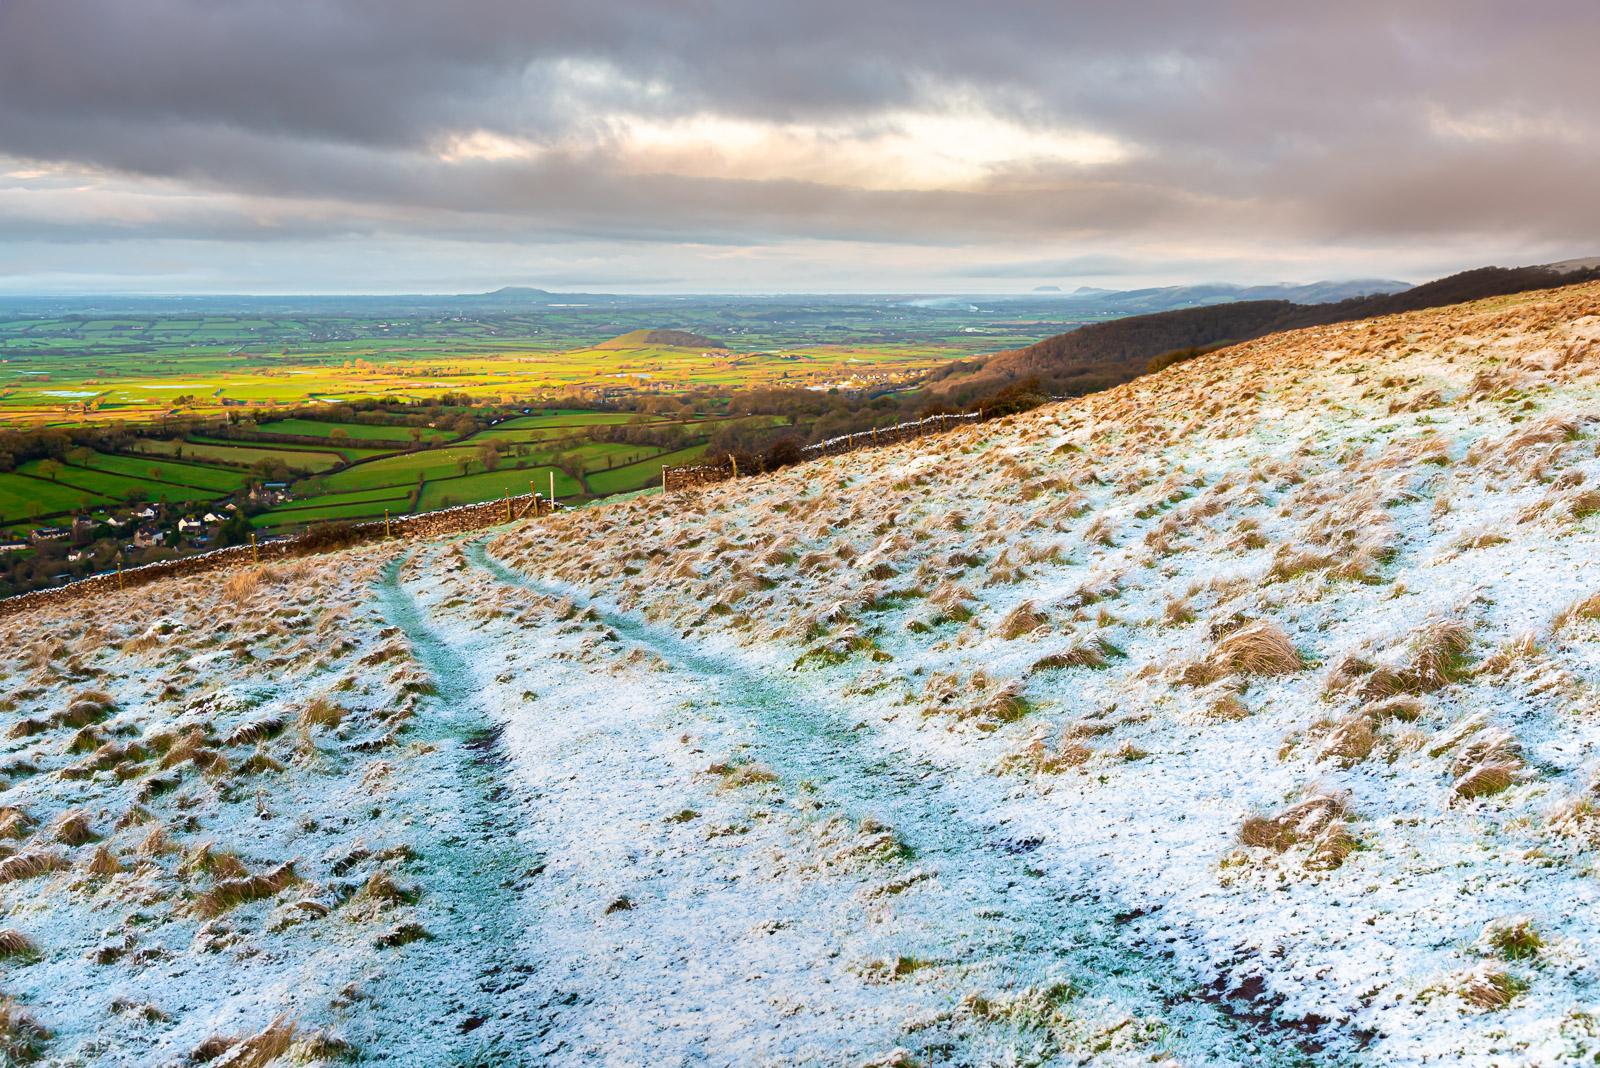 Towards Brent Knoll - From Cooks Fields, Mendip Hills, Somerset, UK. JB1_1272H